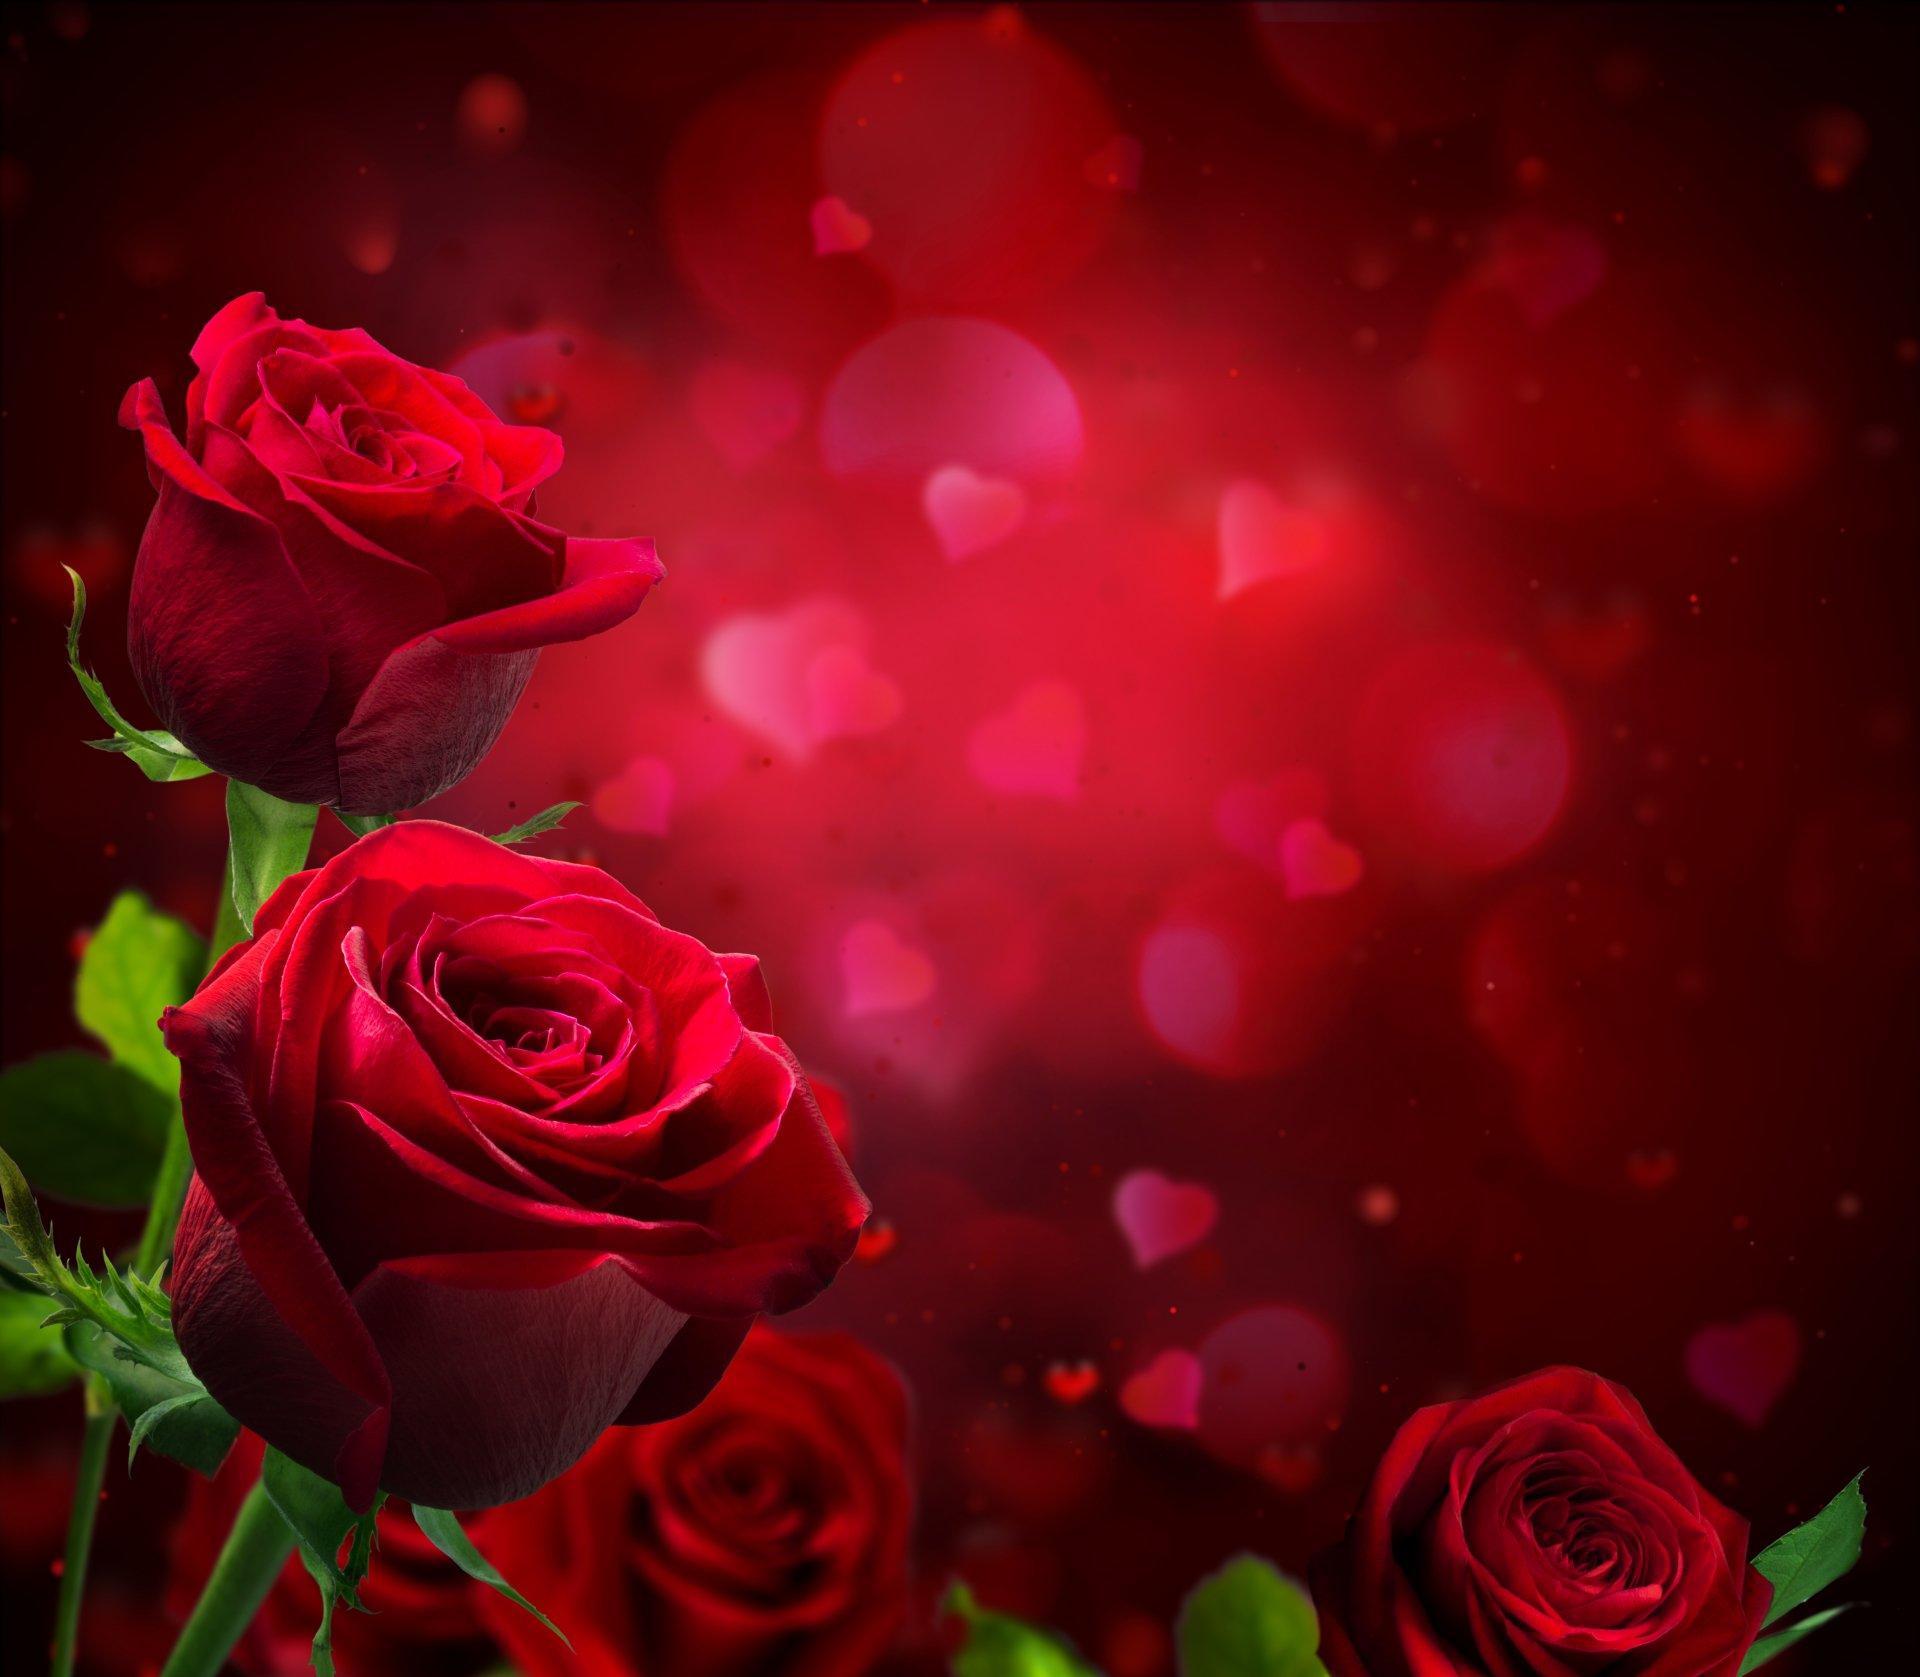 Rose 5k Retina Ultra HD Wallpaper